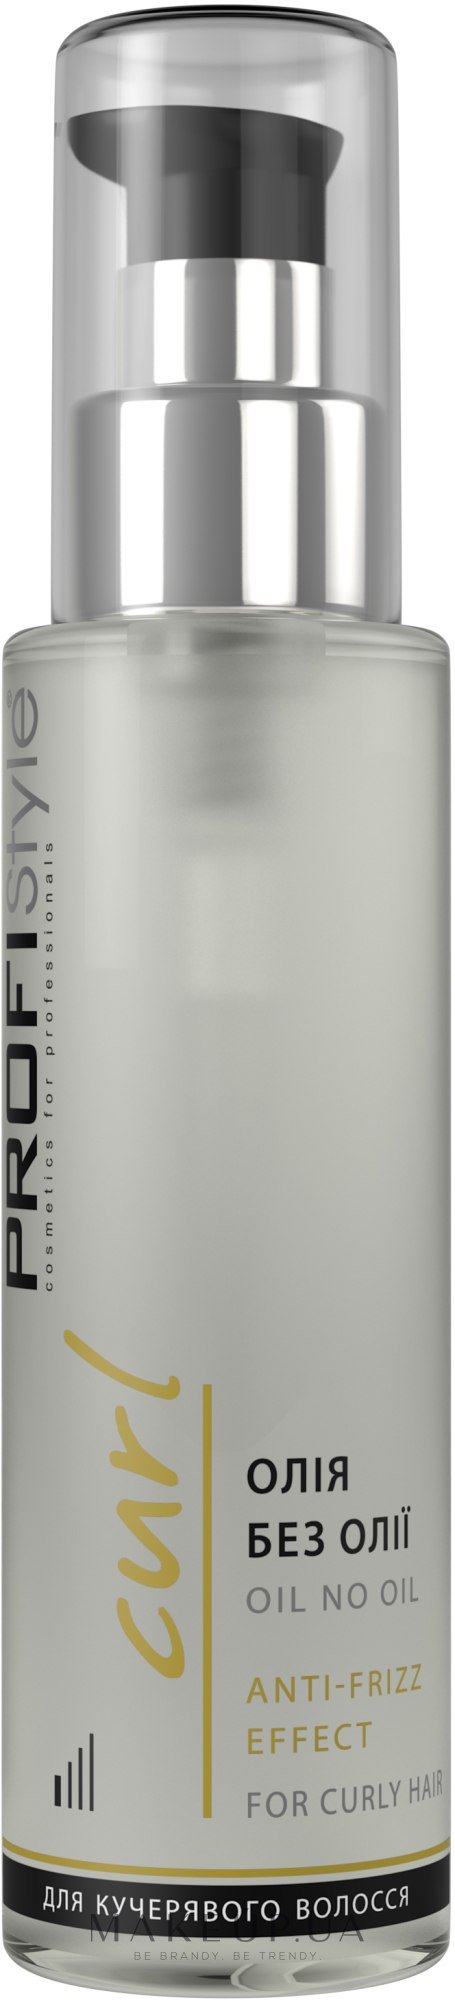 Масло для кудрявых волос - Profi Style Curl Oil No Oil Anti-Frizz Effect — фото 100ml